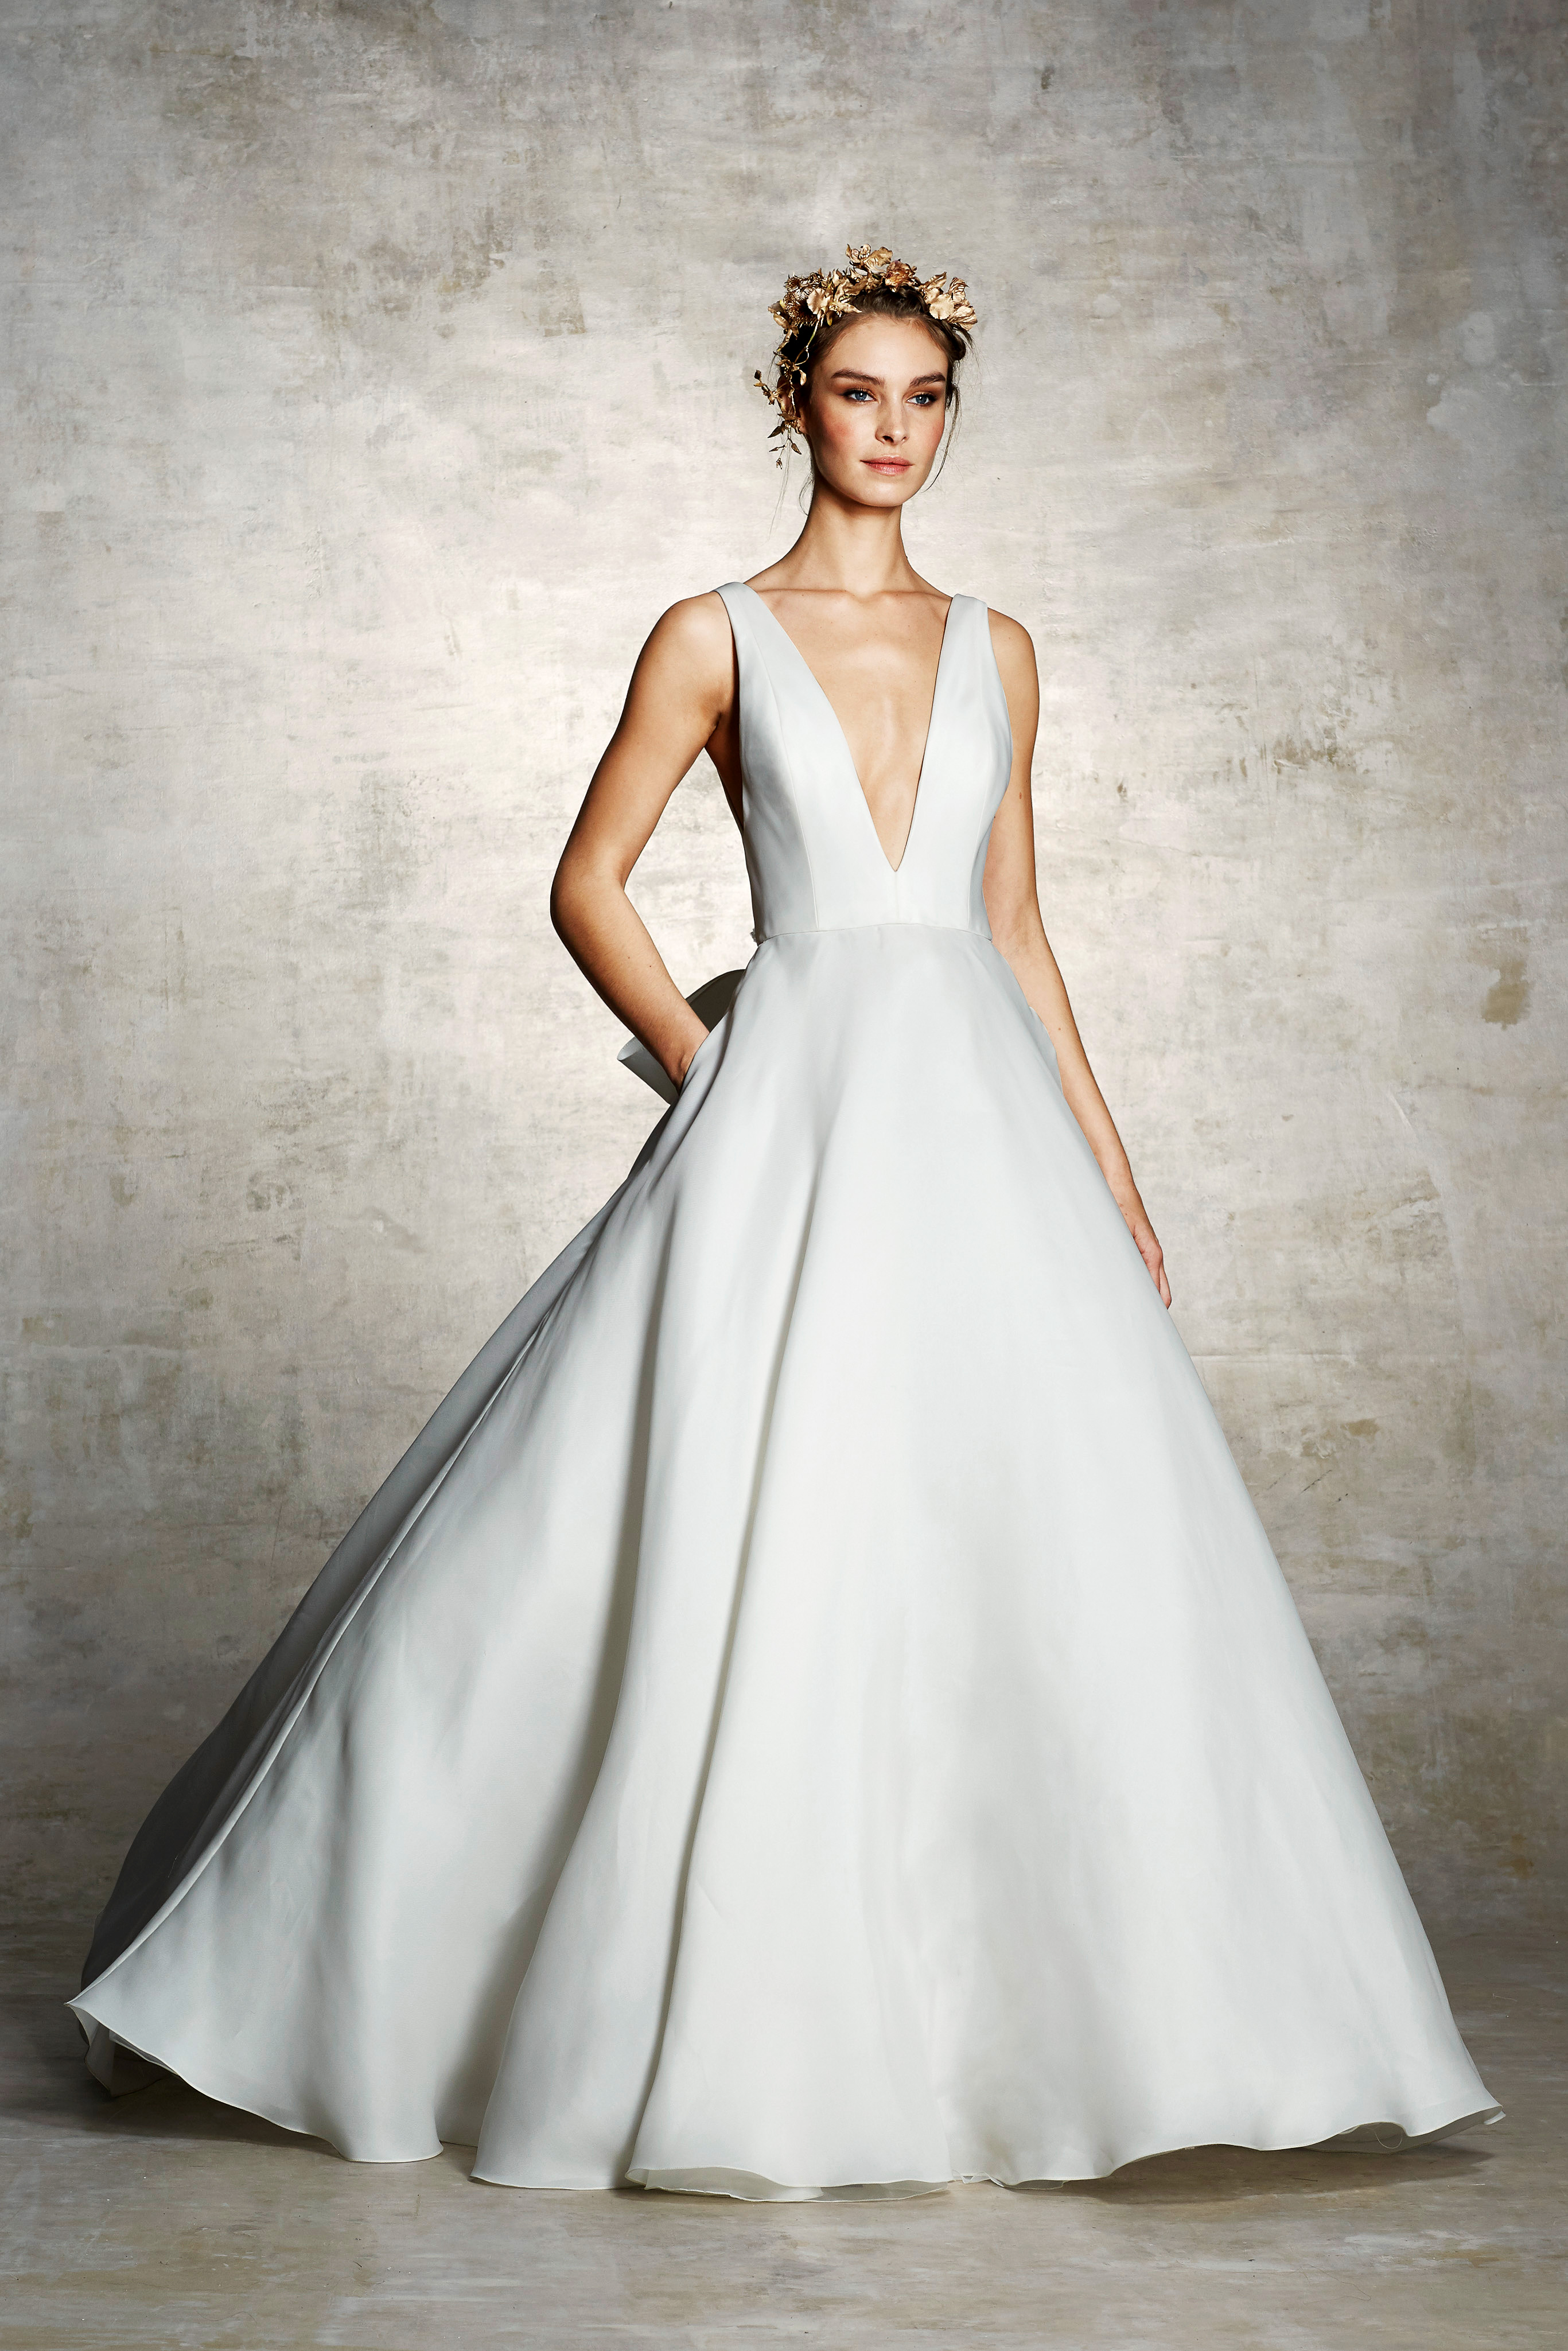 marchesa bridal wedding dress deep v sleeveless a-line